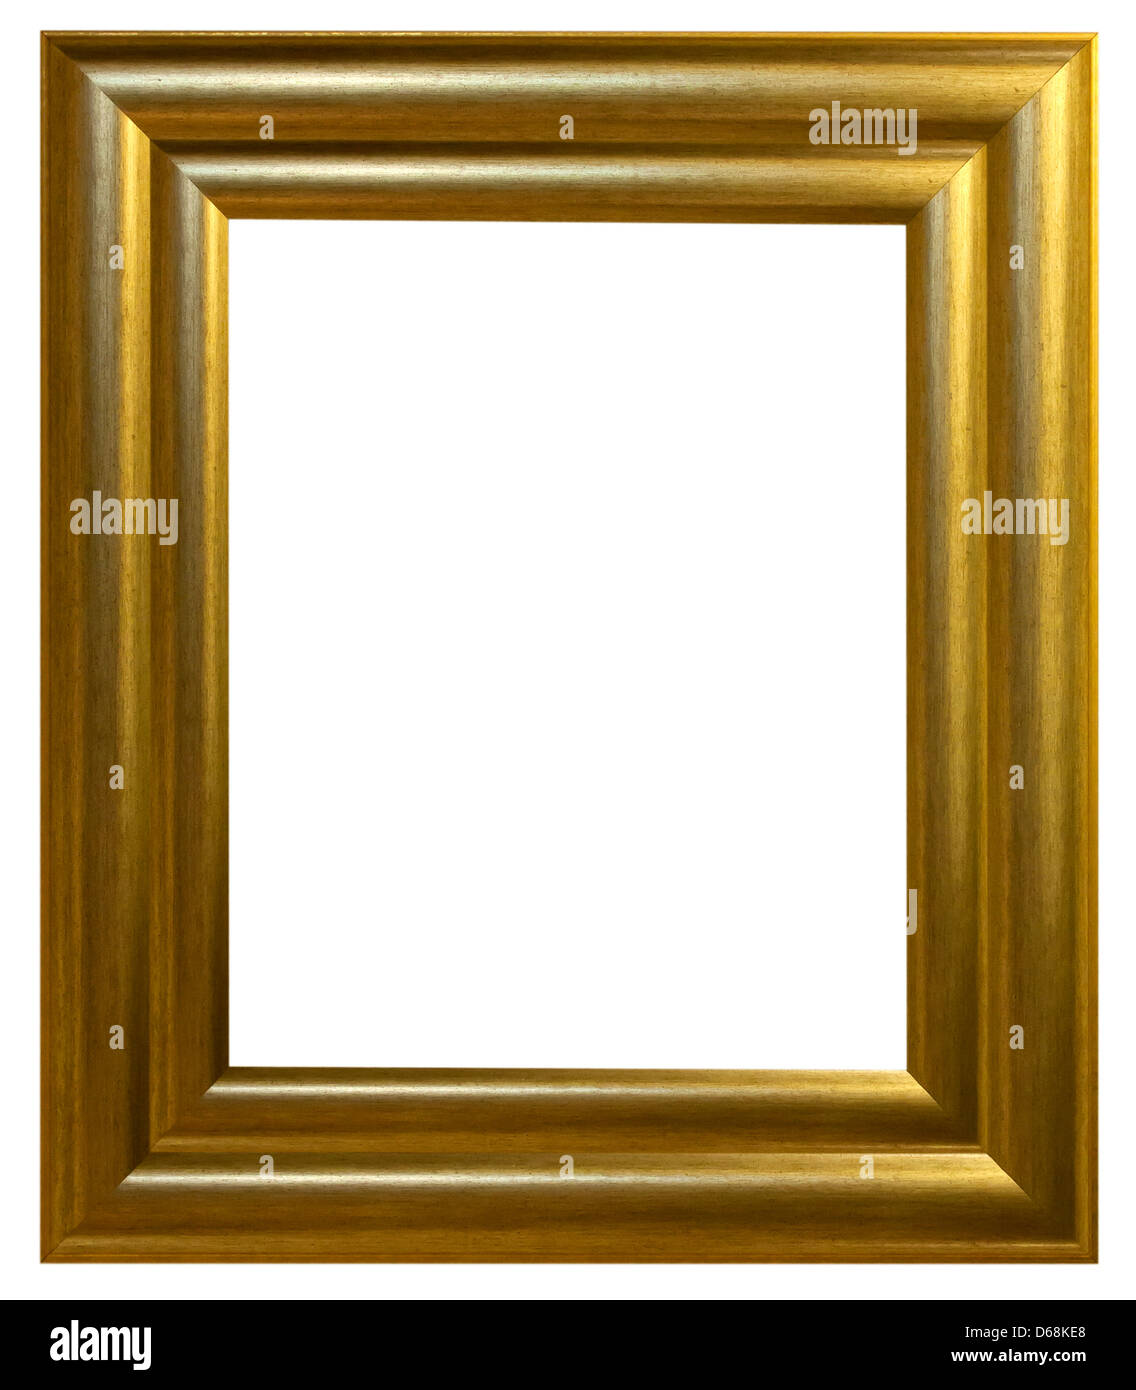 Painting Frame Gold Stockfotos & Painting Frame Gold Bilder - Seite ...